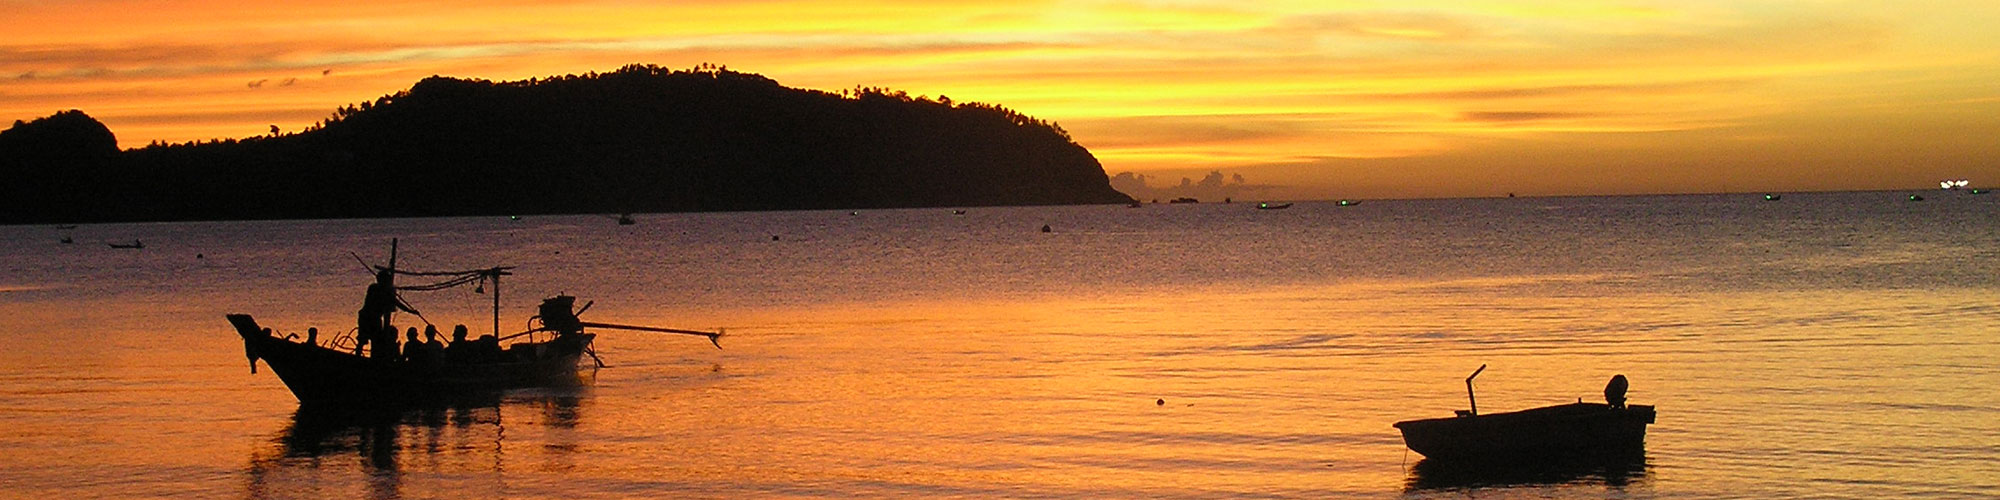 Thailand-sunset